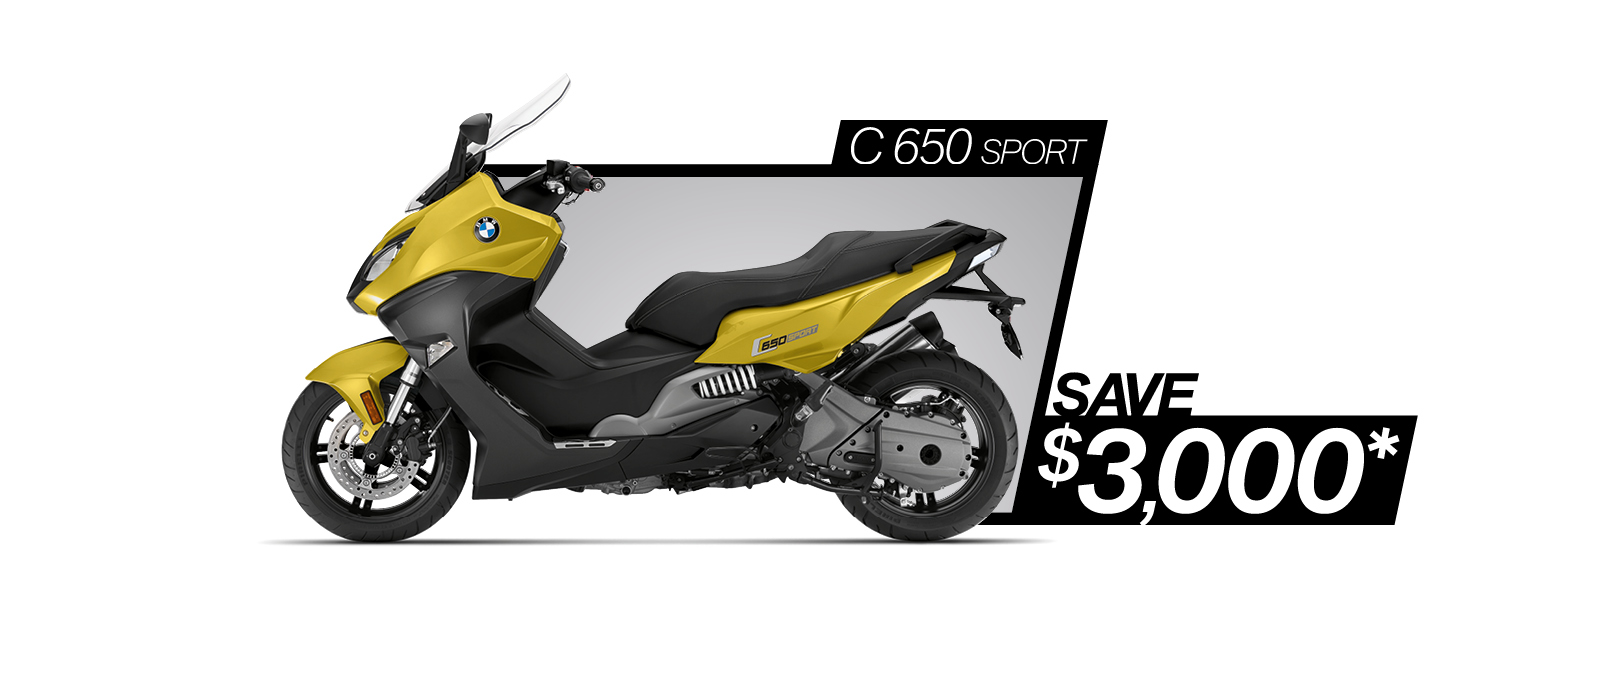 C 650 Sport on sale